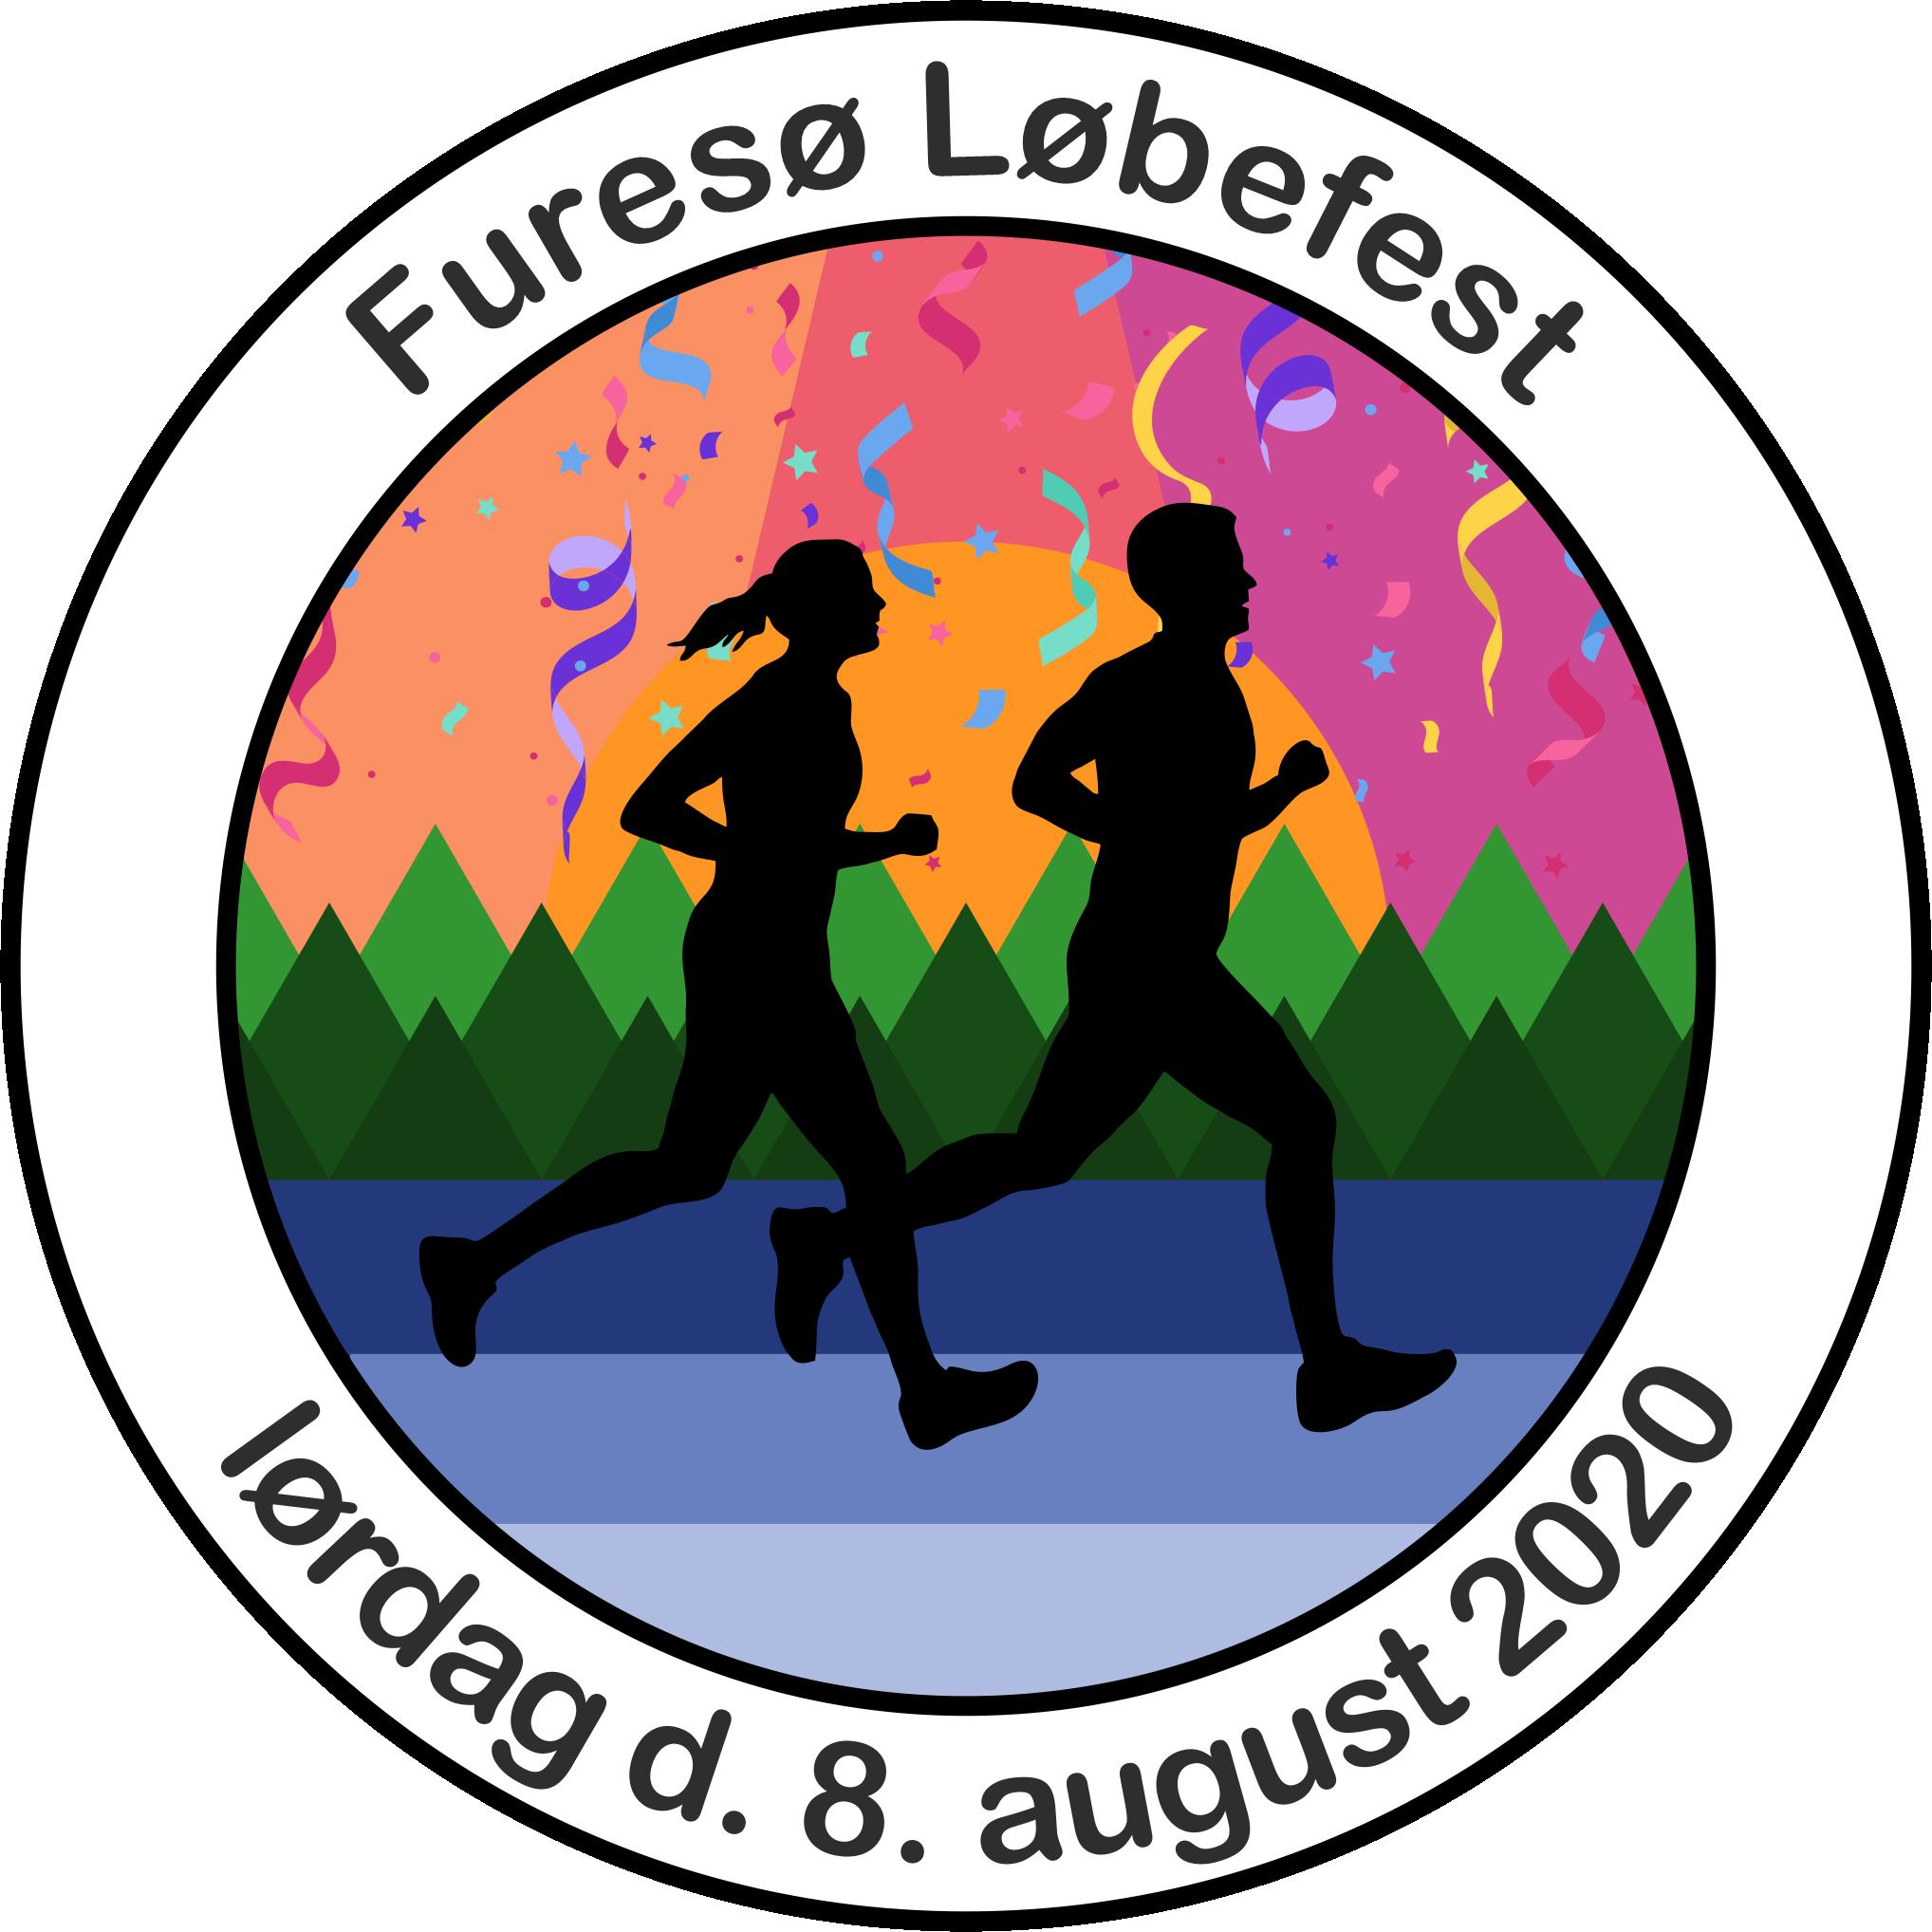 Furesø Løbefest 2020